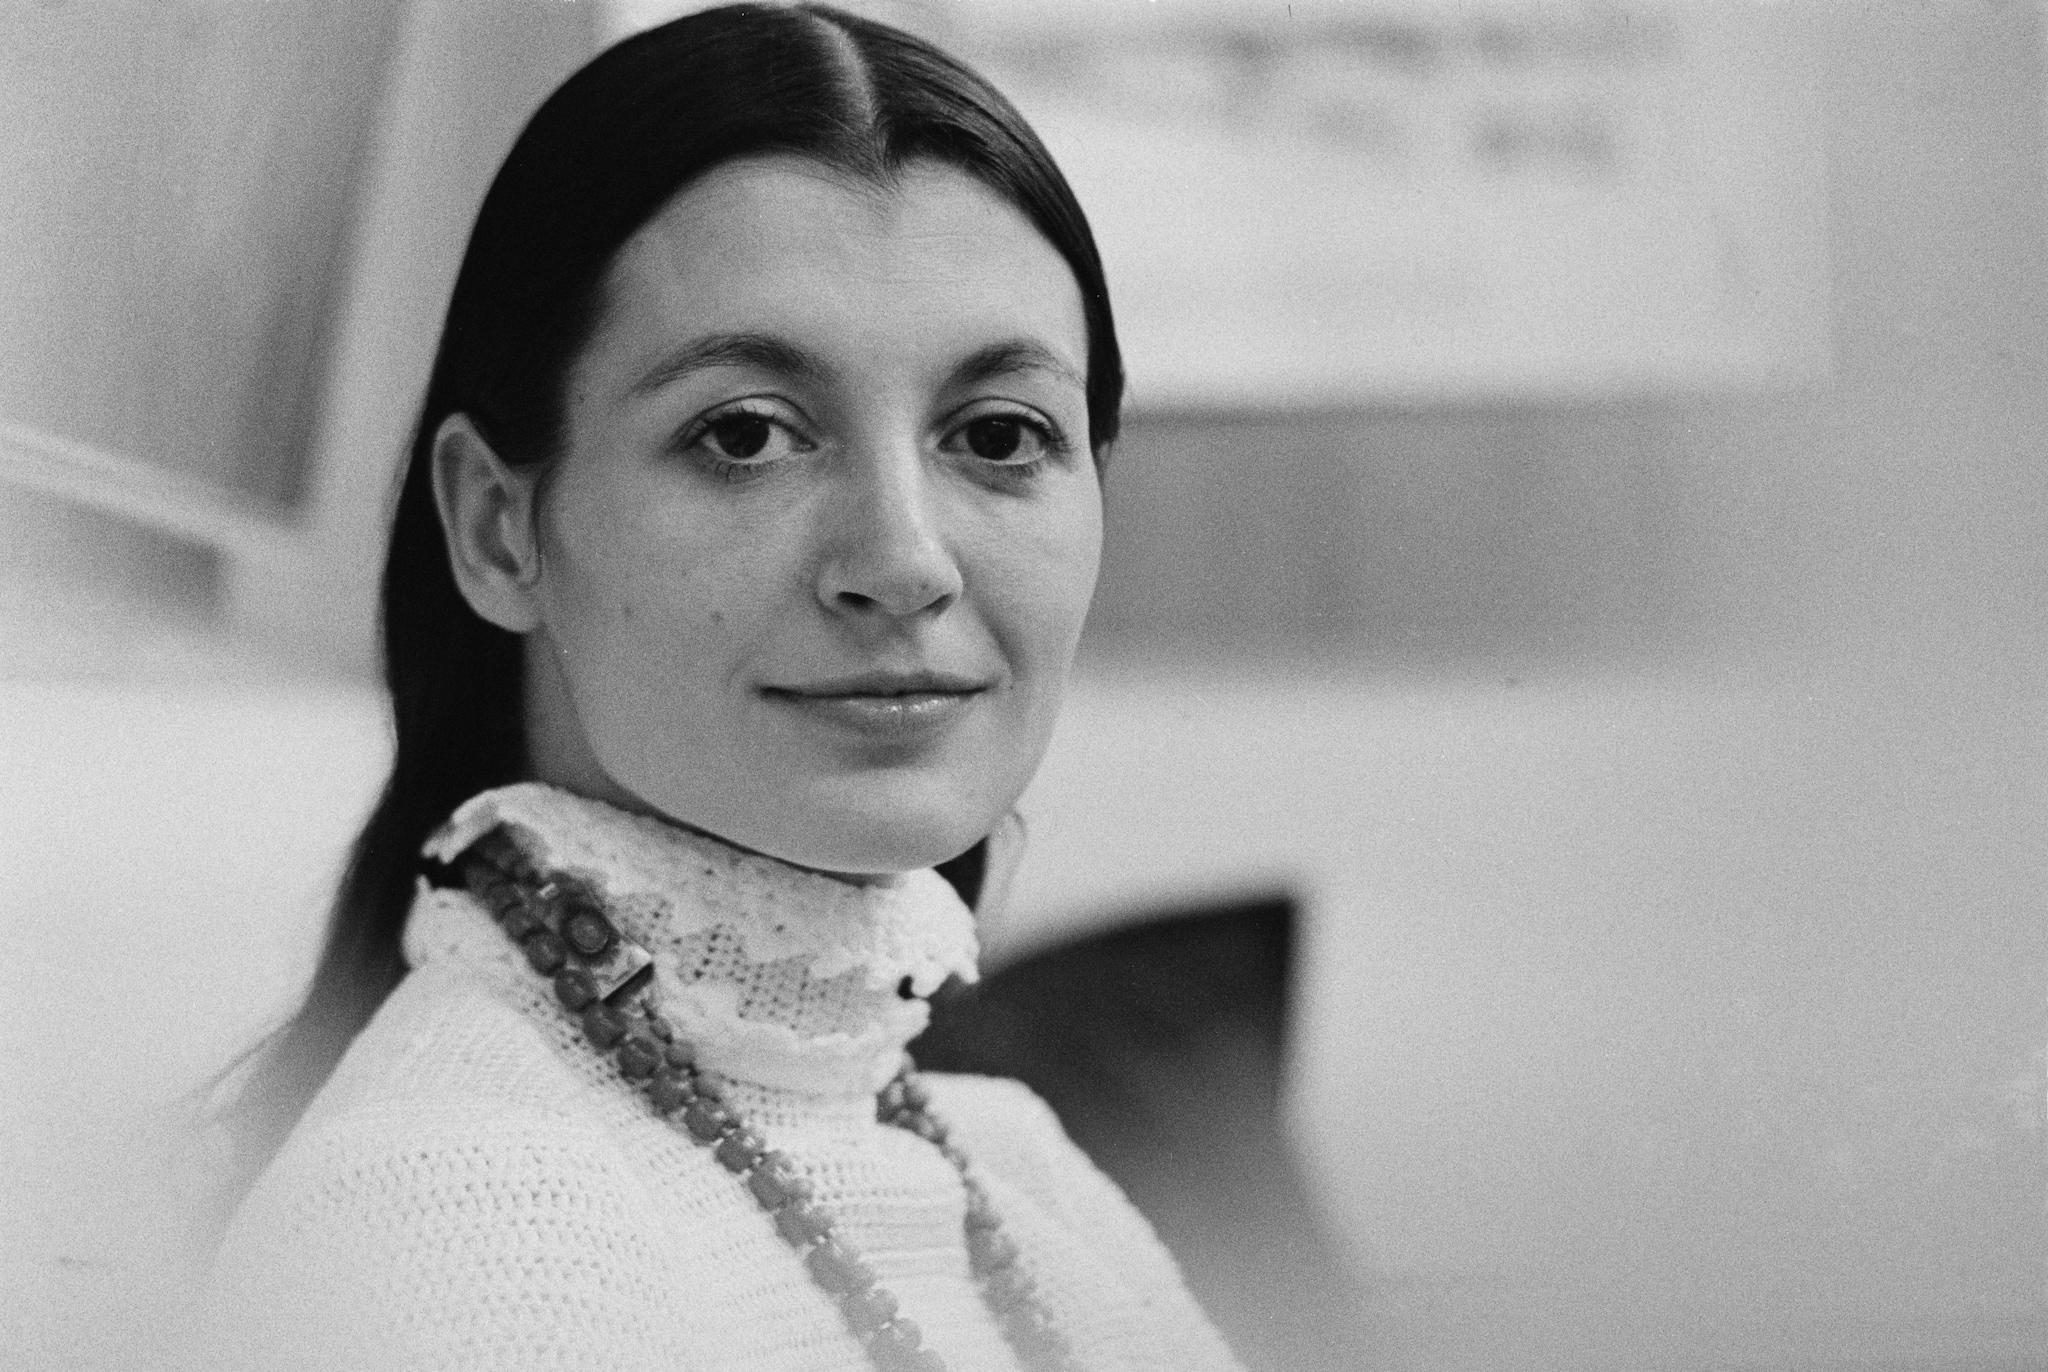 Carla Fracci (1970)